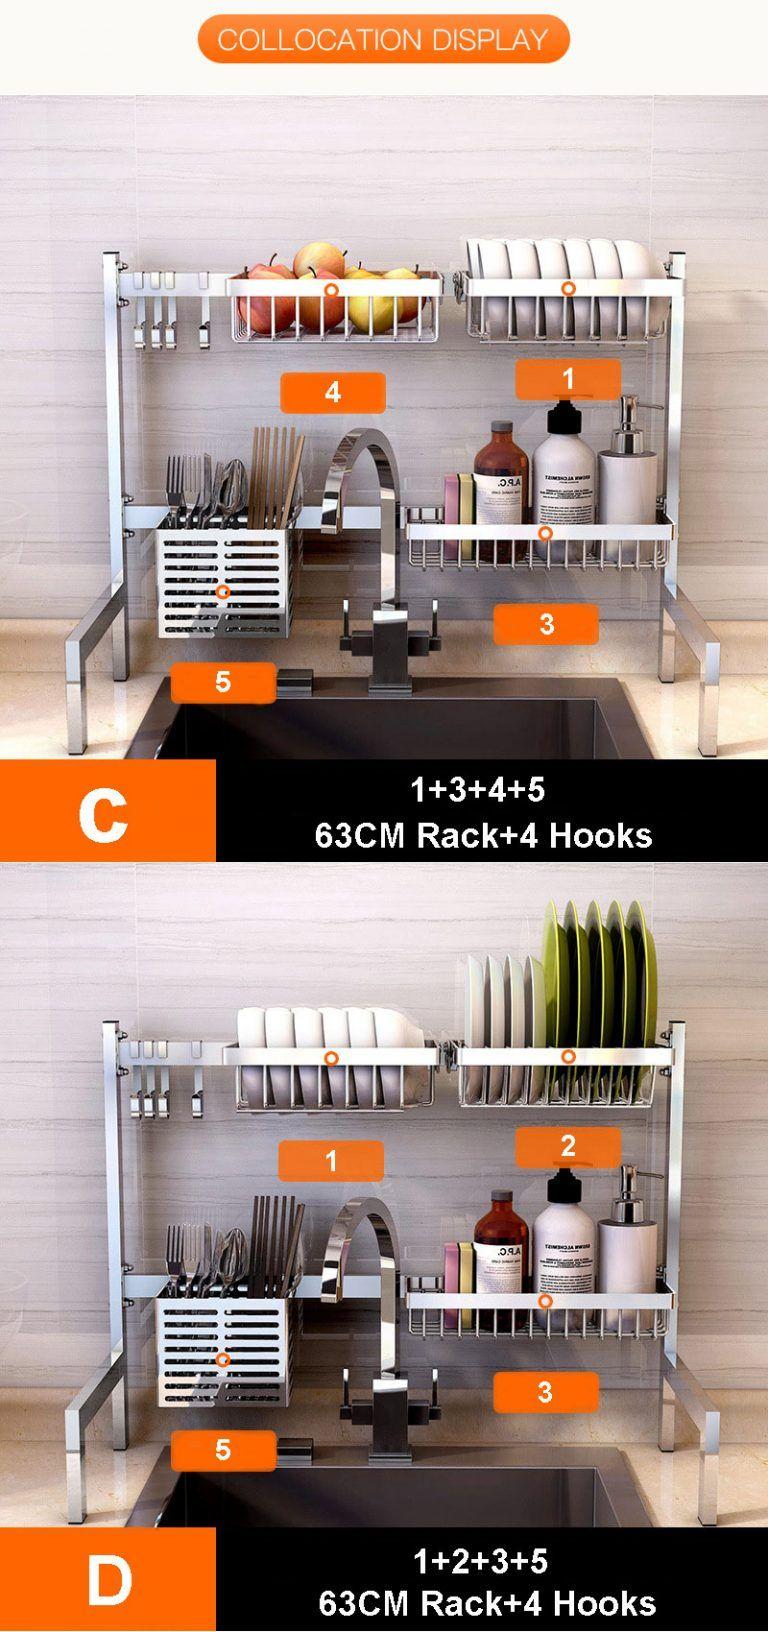 RackShack™ Over The Sink Dish Drying Rack - Dish Rack #dishracks